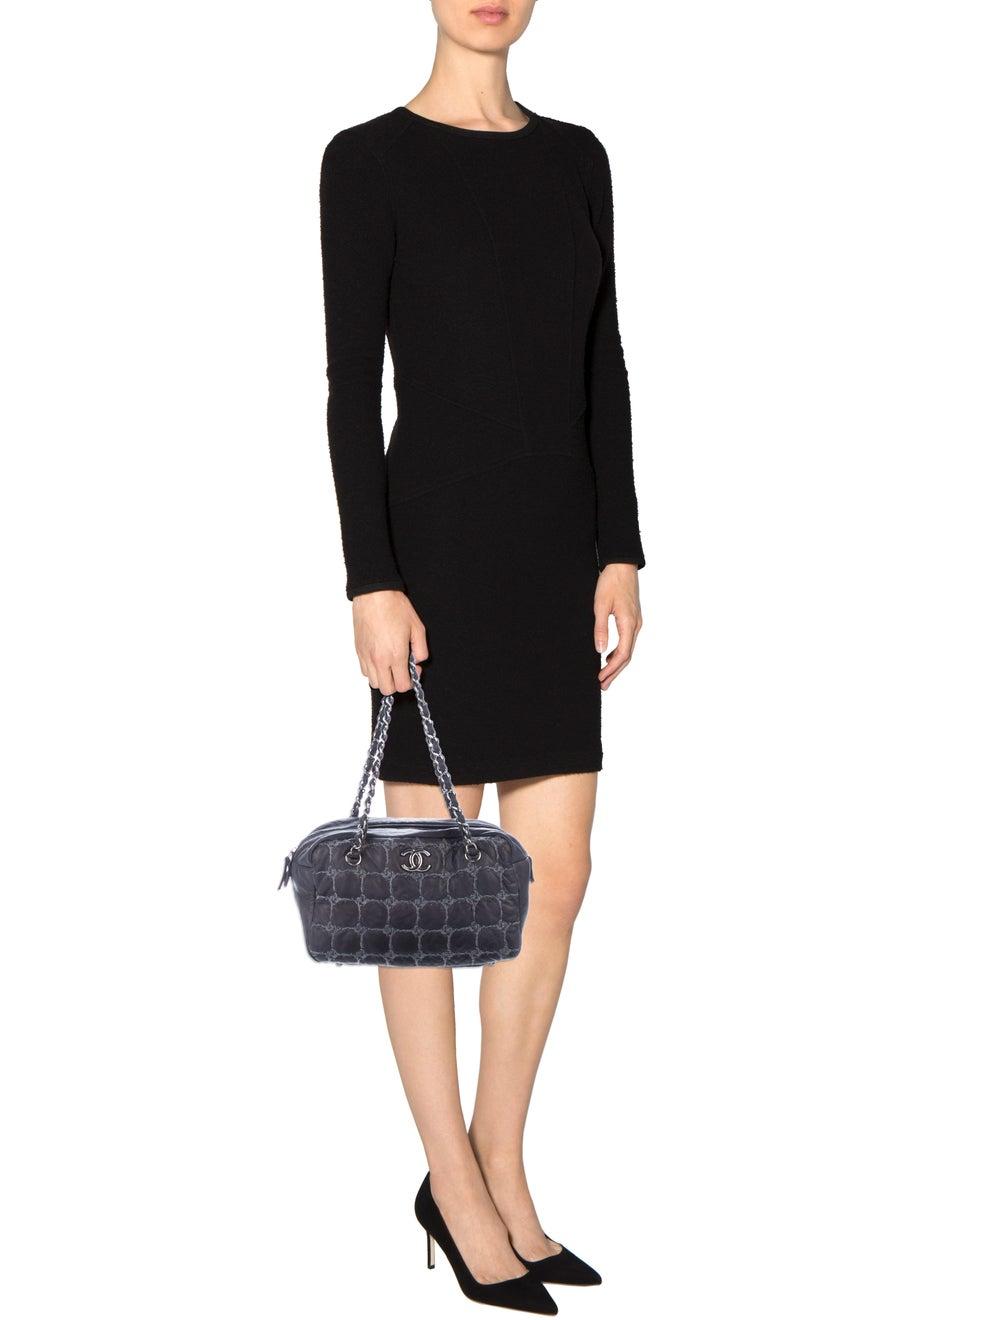 Chanel Tweed Stitch Bowler Bag Blue - image 2